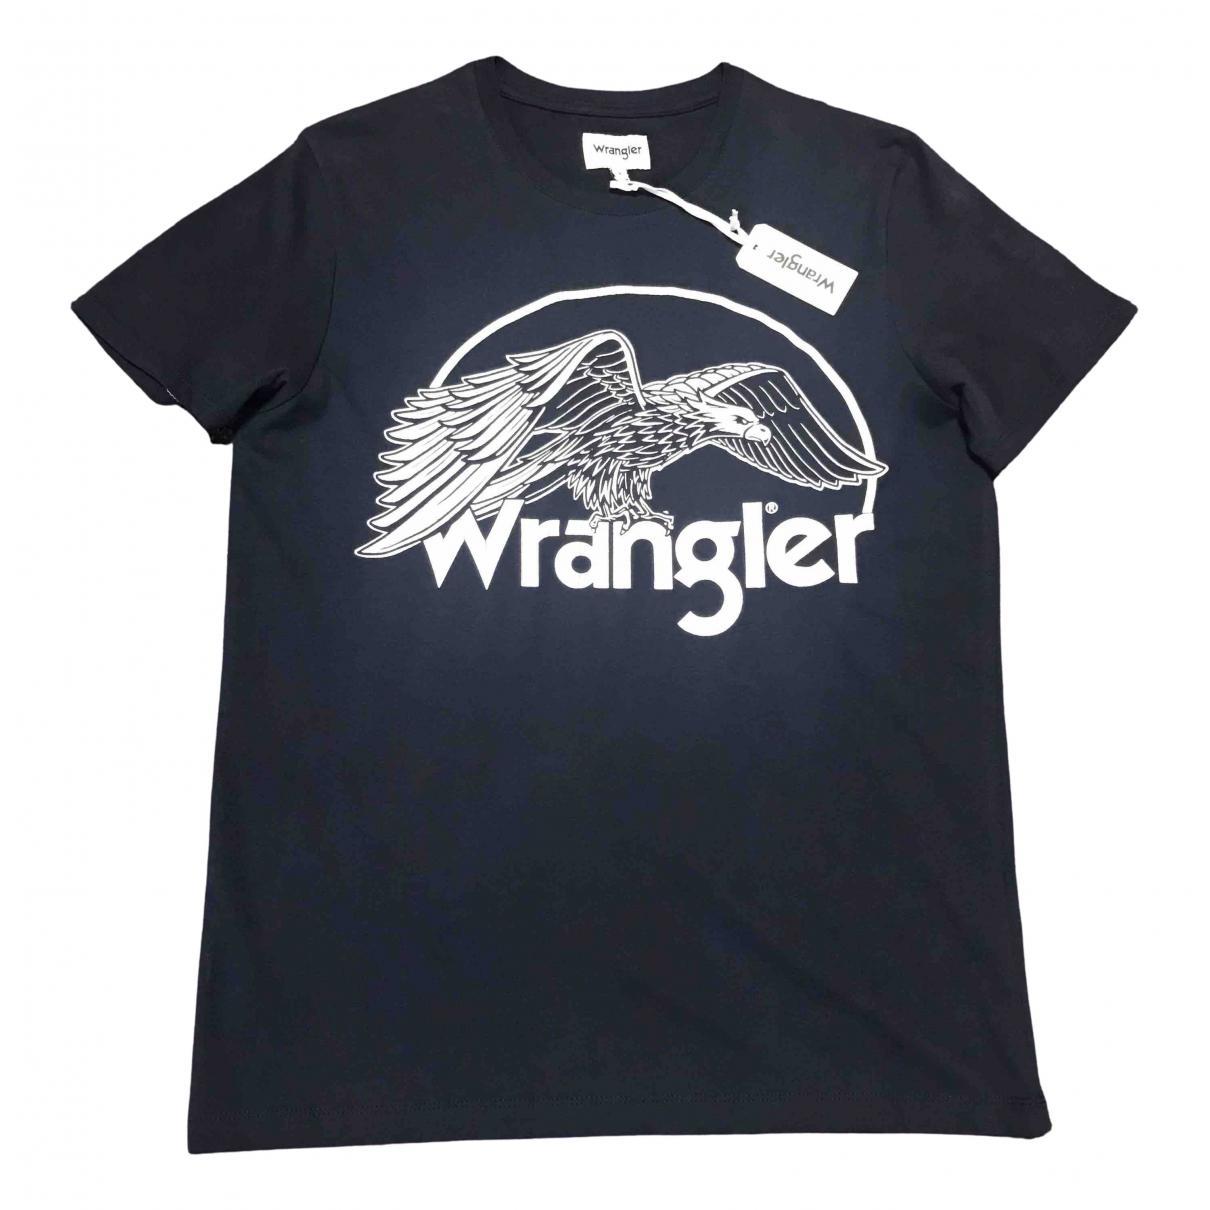 Wrangler - Tee shirts   pour homme en coton - anthracite